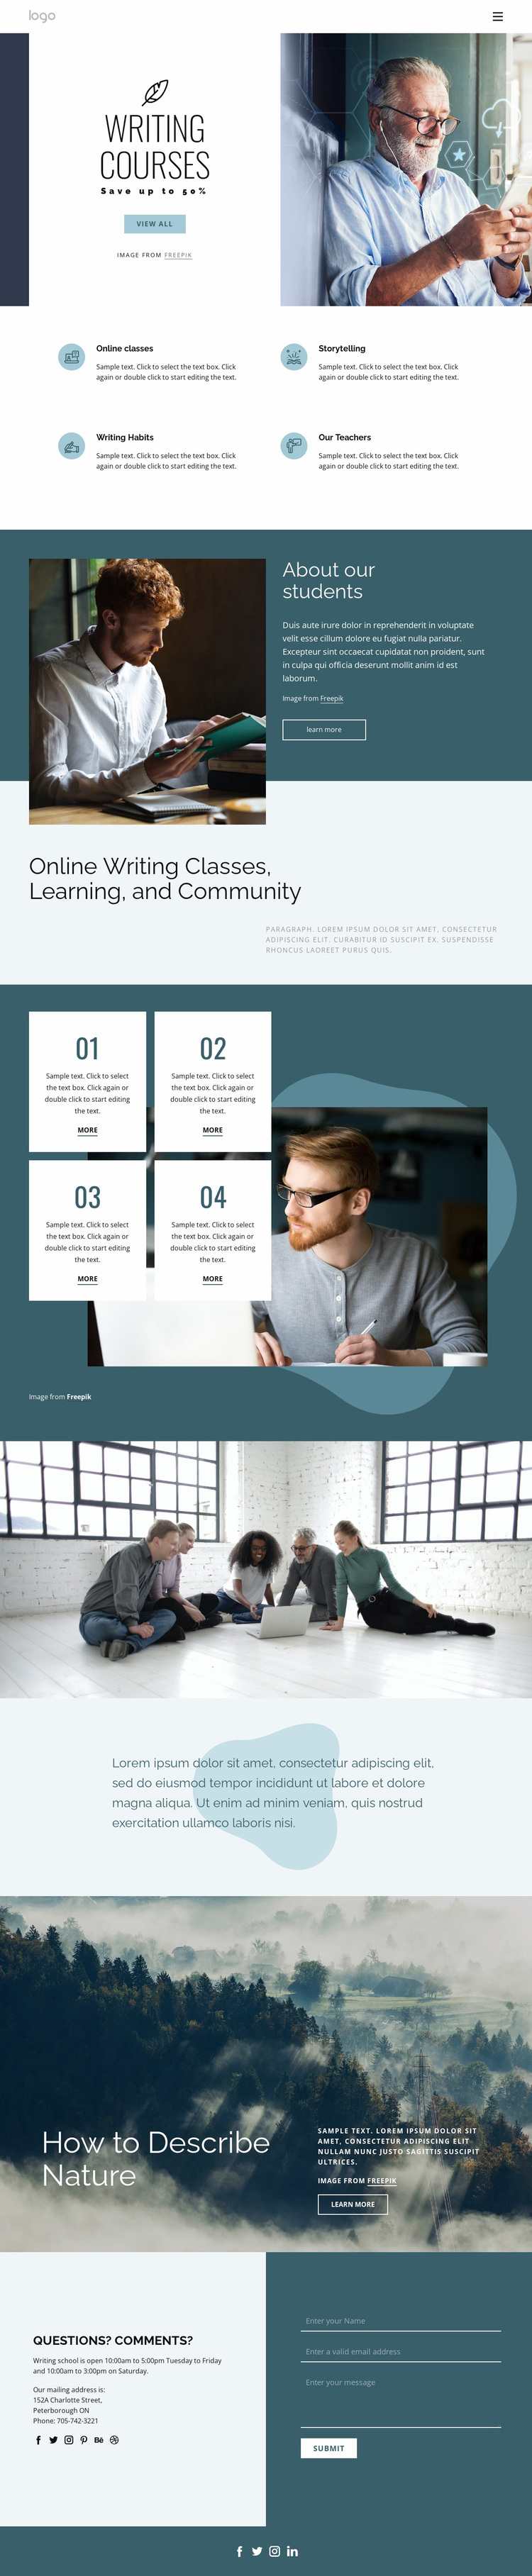 Creative writing courses Website Design